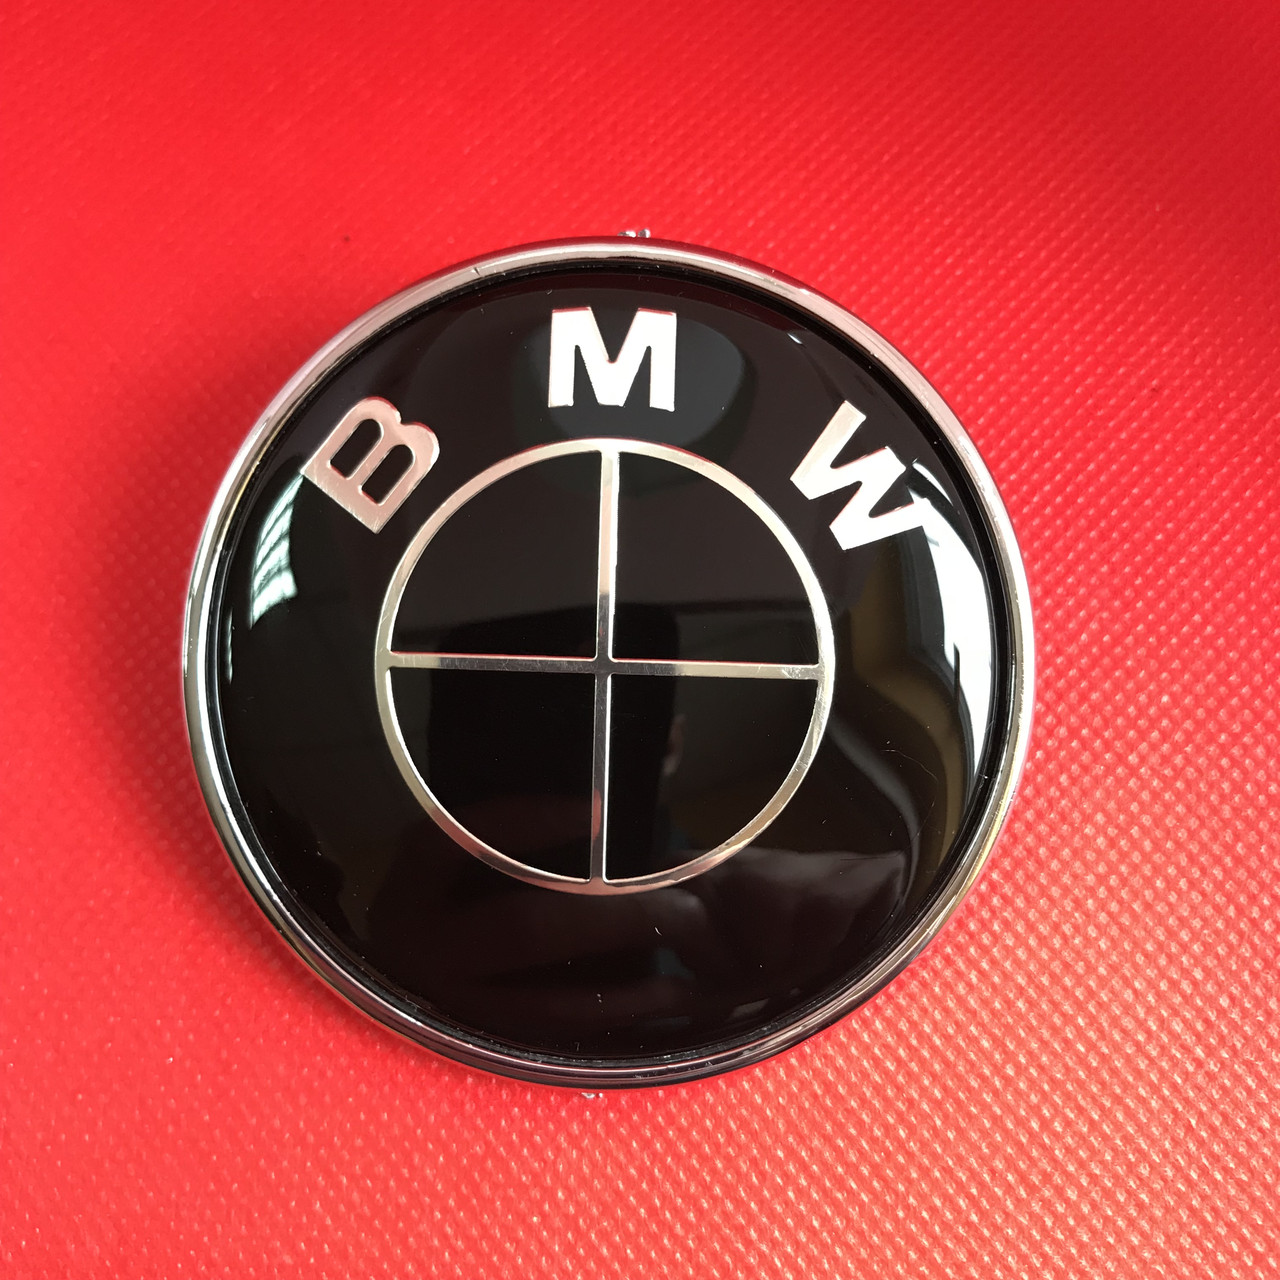 Емблема, логотип BMW БМВ М 82 мм на капот, багажник чорна